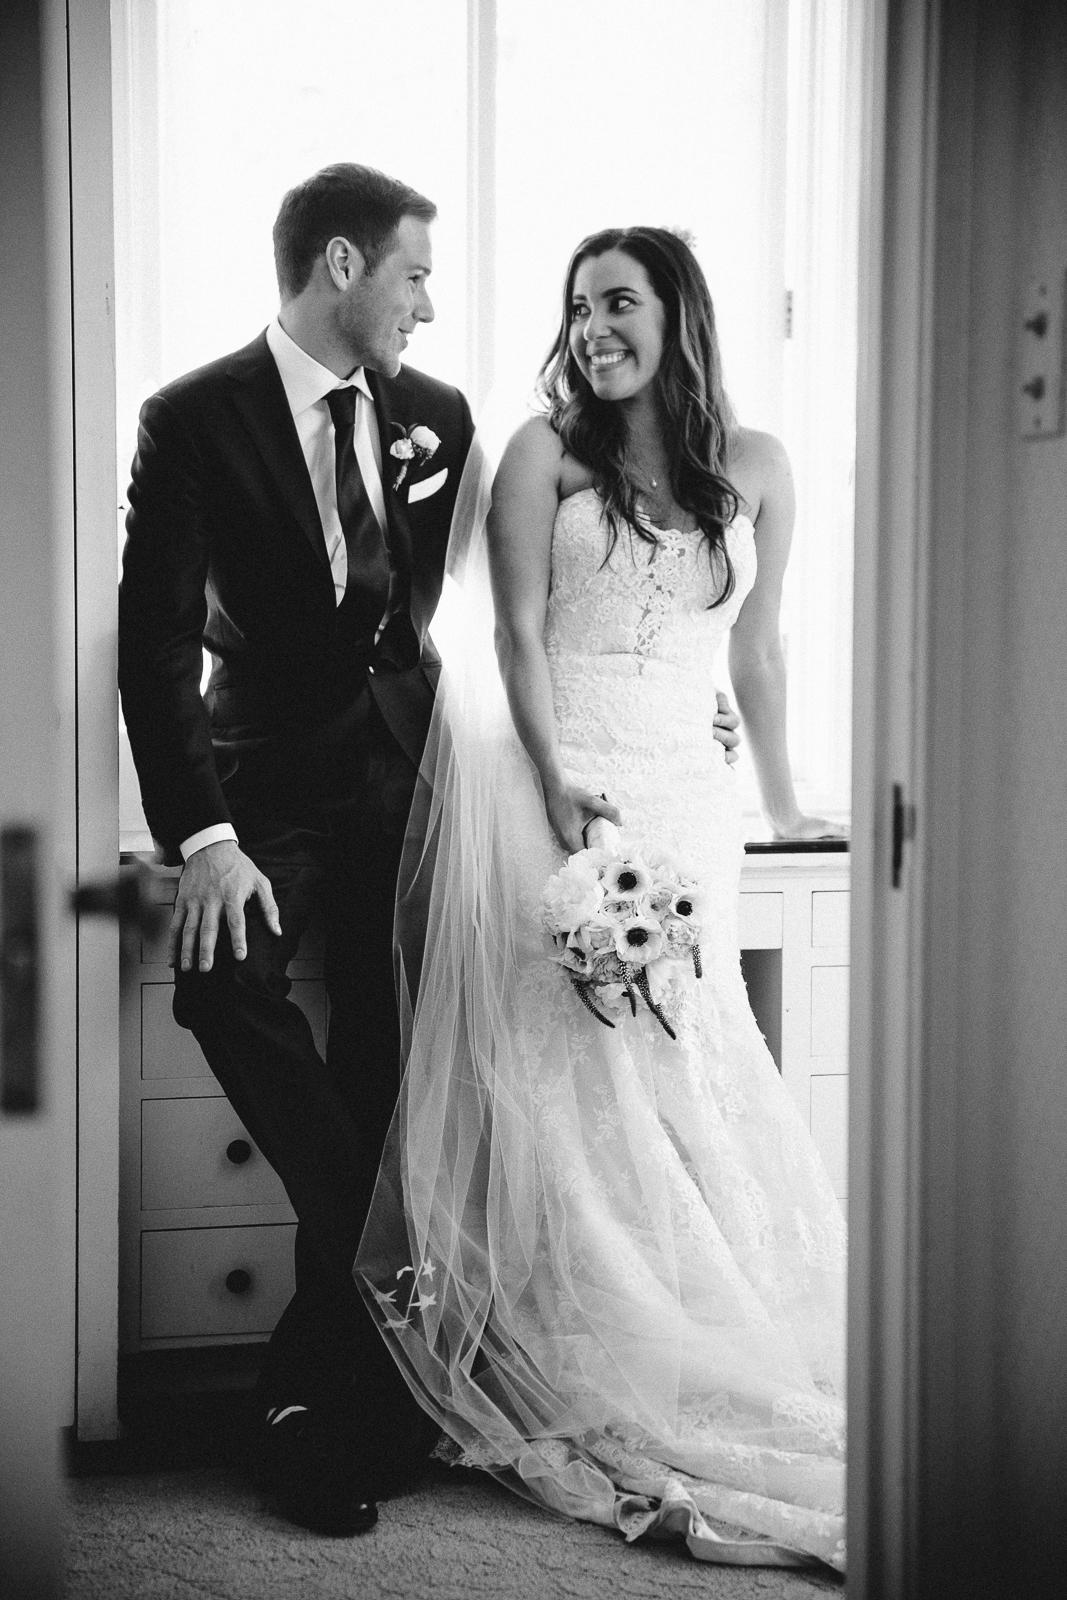 Amanda_&_Steve_Wedding_Darlington_House_La_Jolla_2015_IMG_6818.JPG